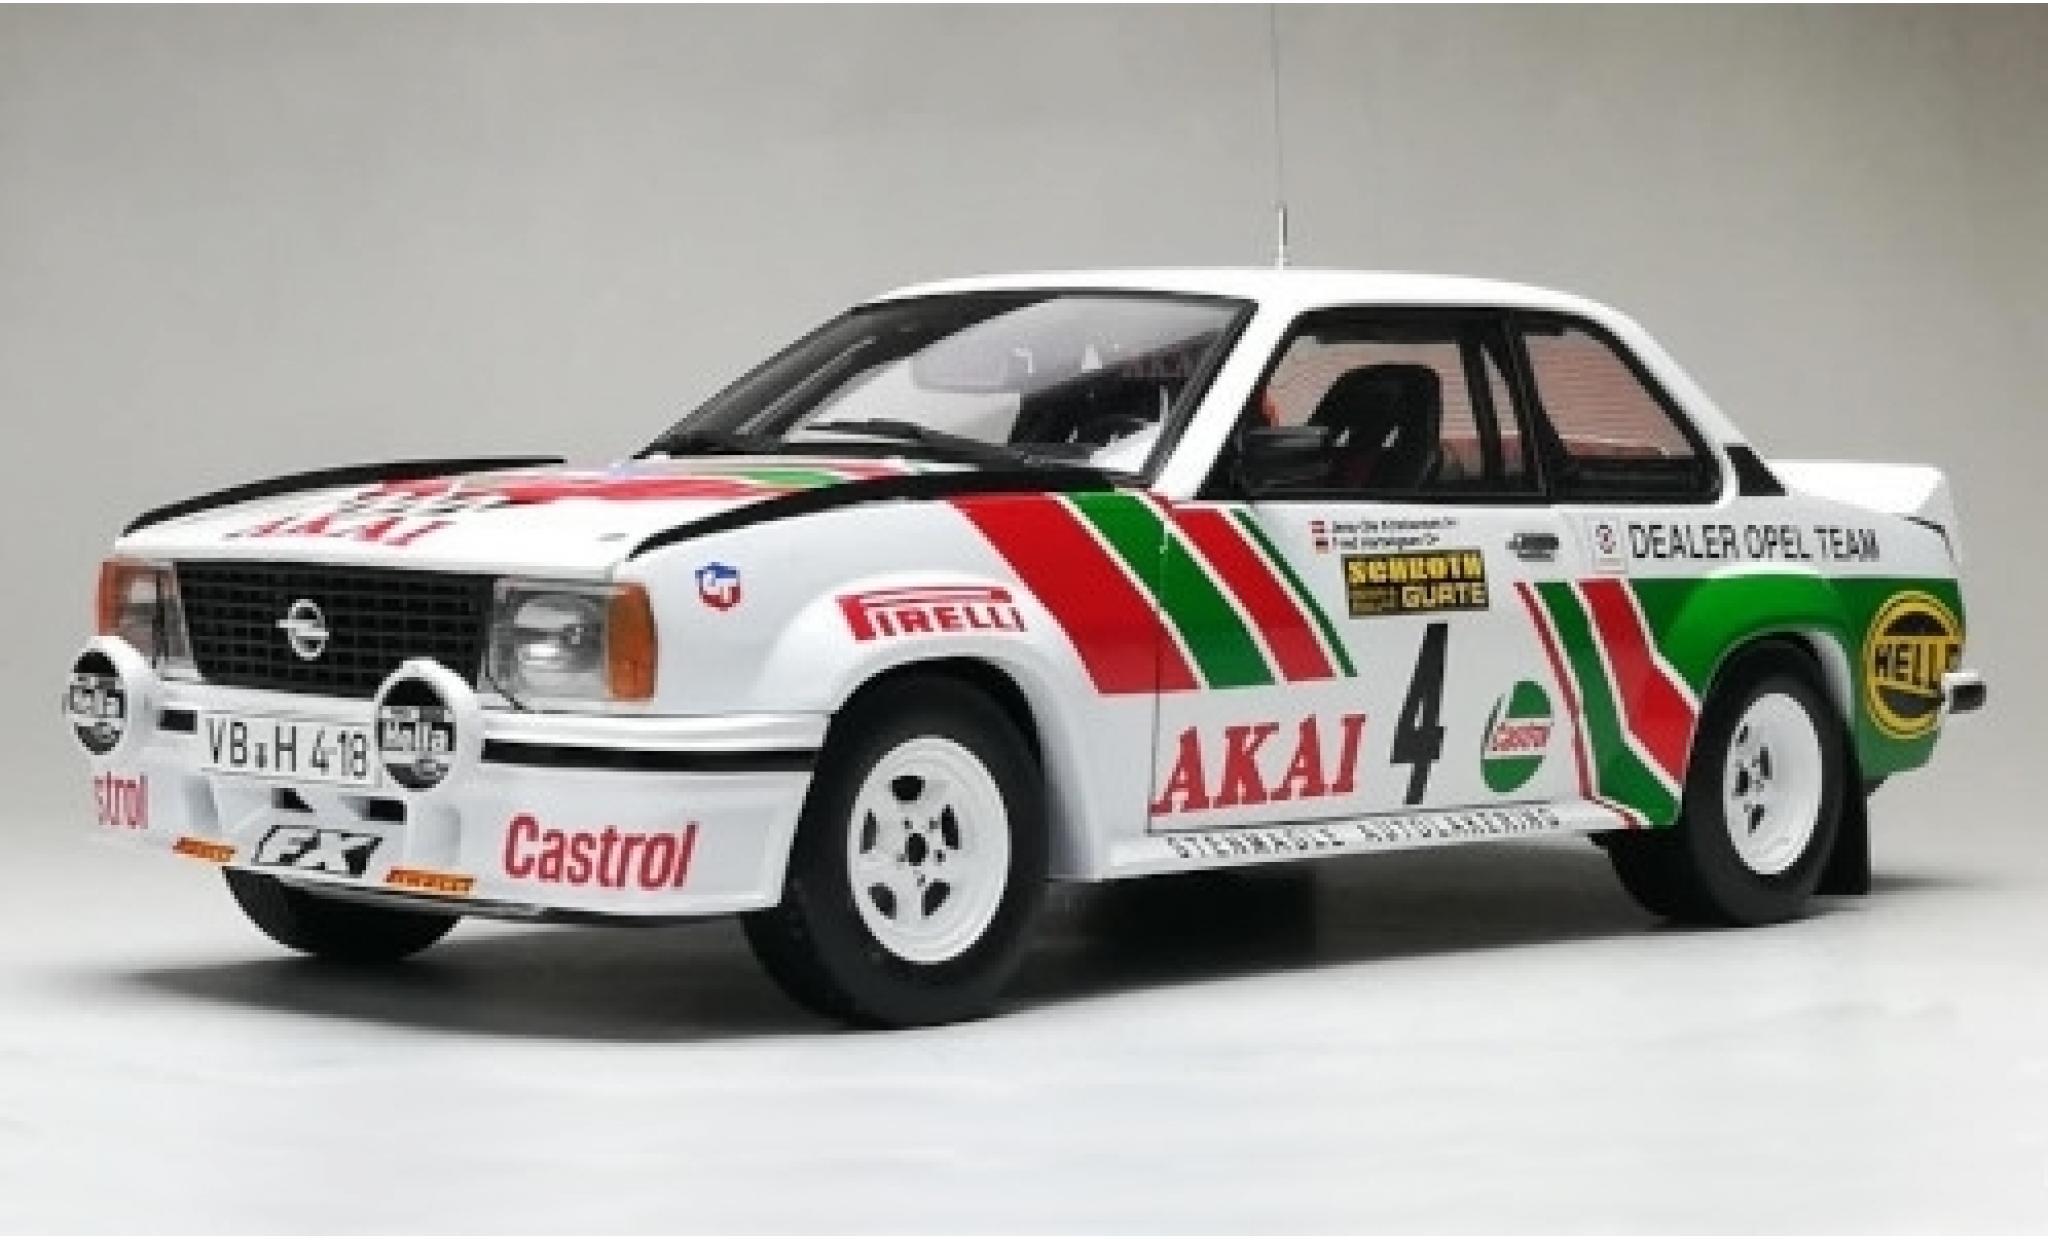 Opel Ascona 1/18 Sun Star B 400 No.4 Dealer Team Castrol International Sachs Winter Rallye 1981 J-O.Kristiansen/F.Hartwigsen